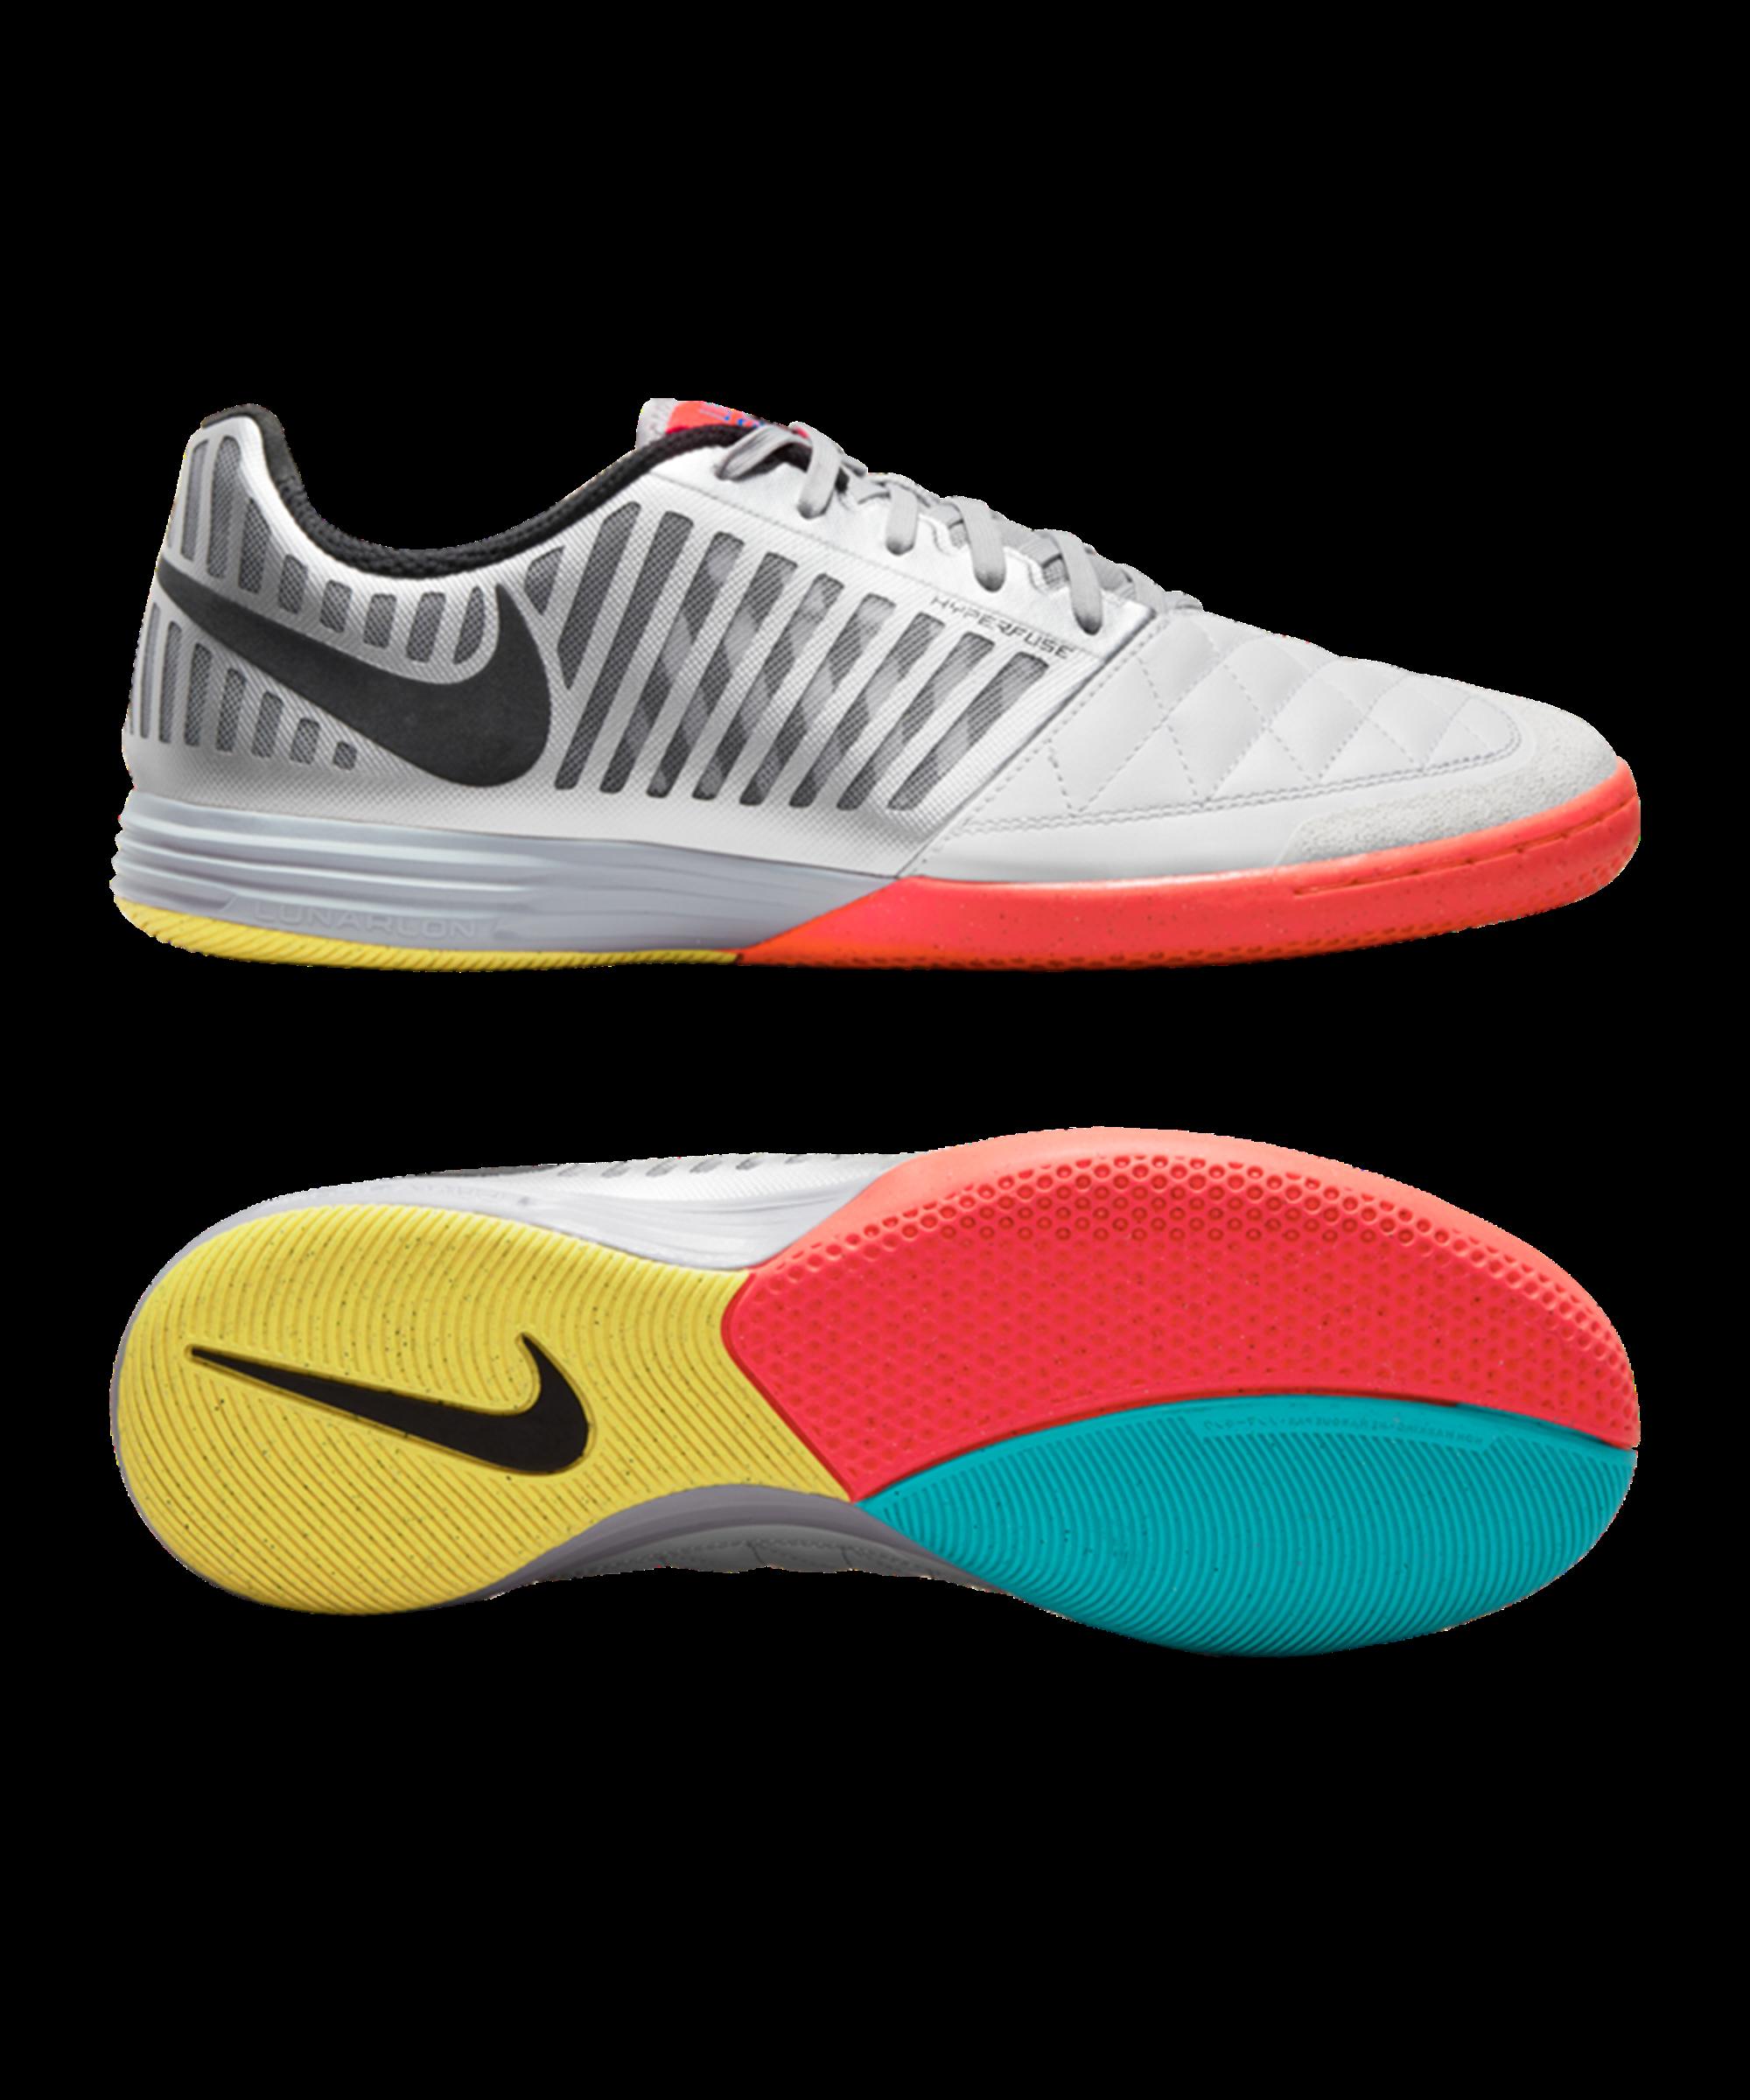 Nike Lunar Gato II IC Indoor